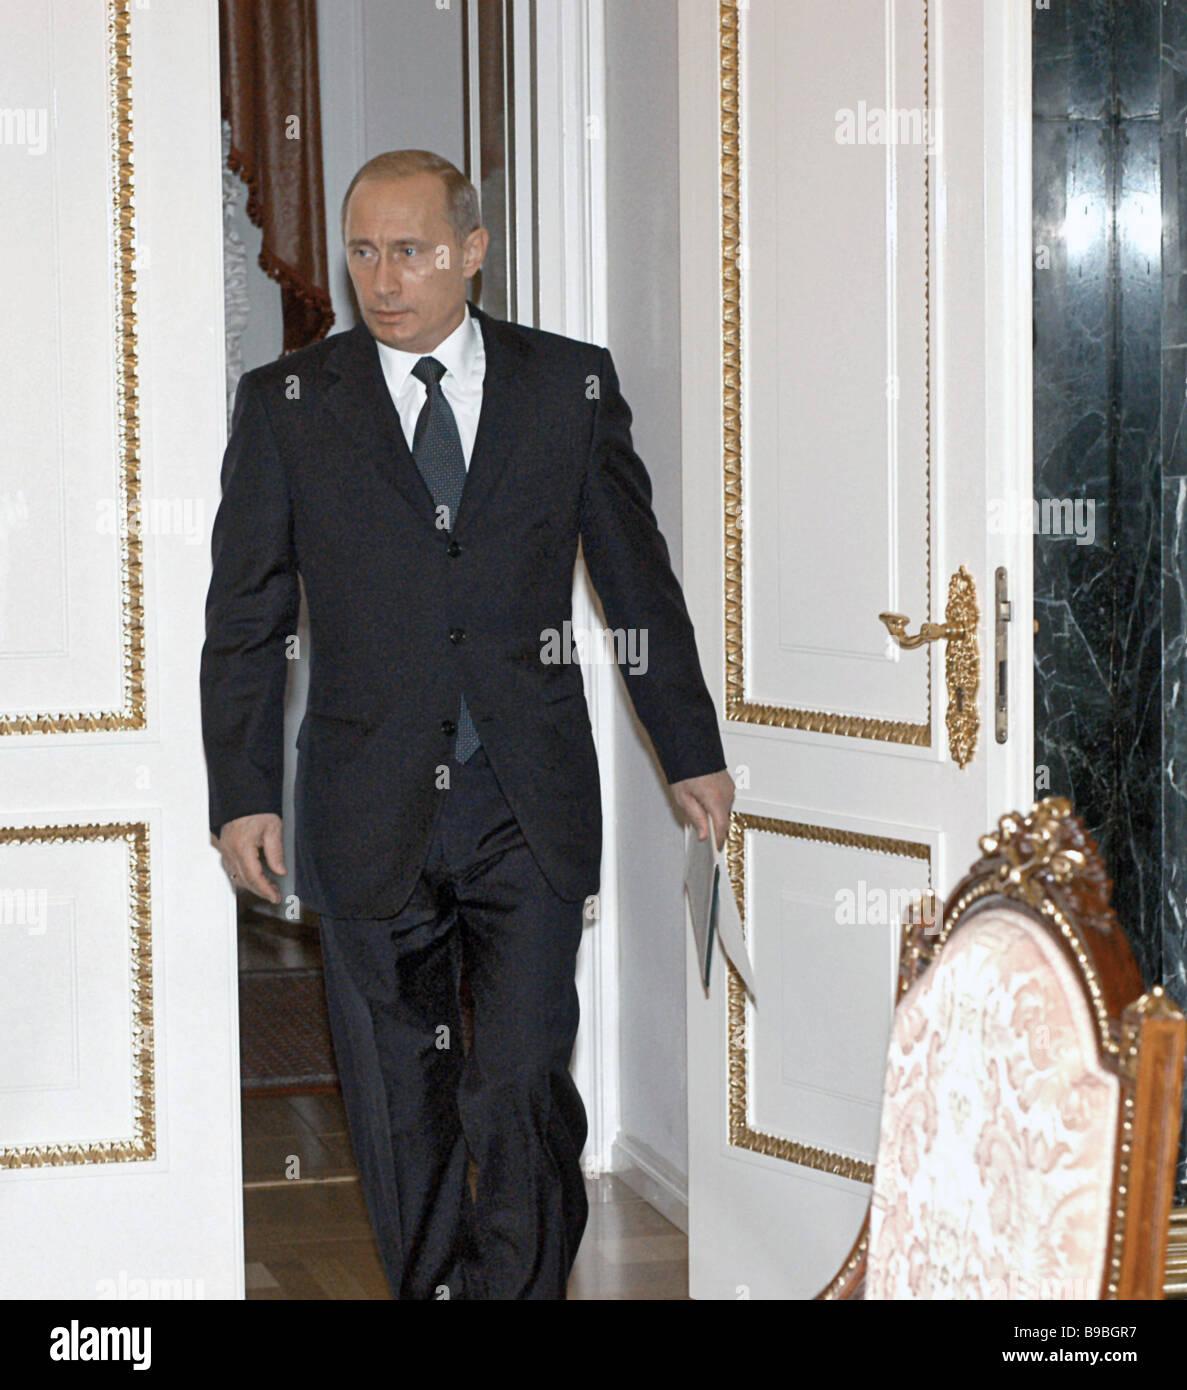 Russian President Vladimir Putin at a regular Cabinet meeting in the Kremlin - Stock Image